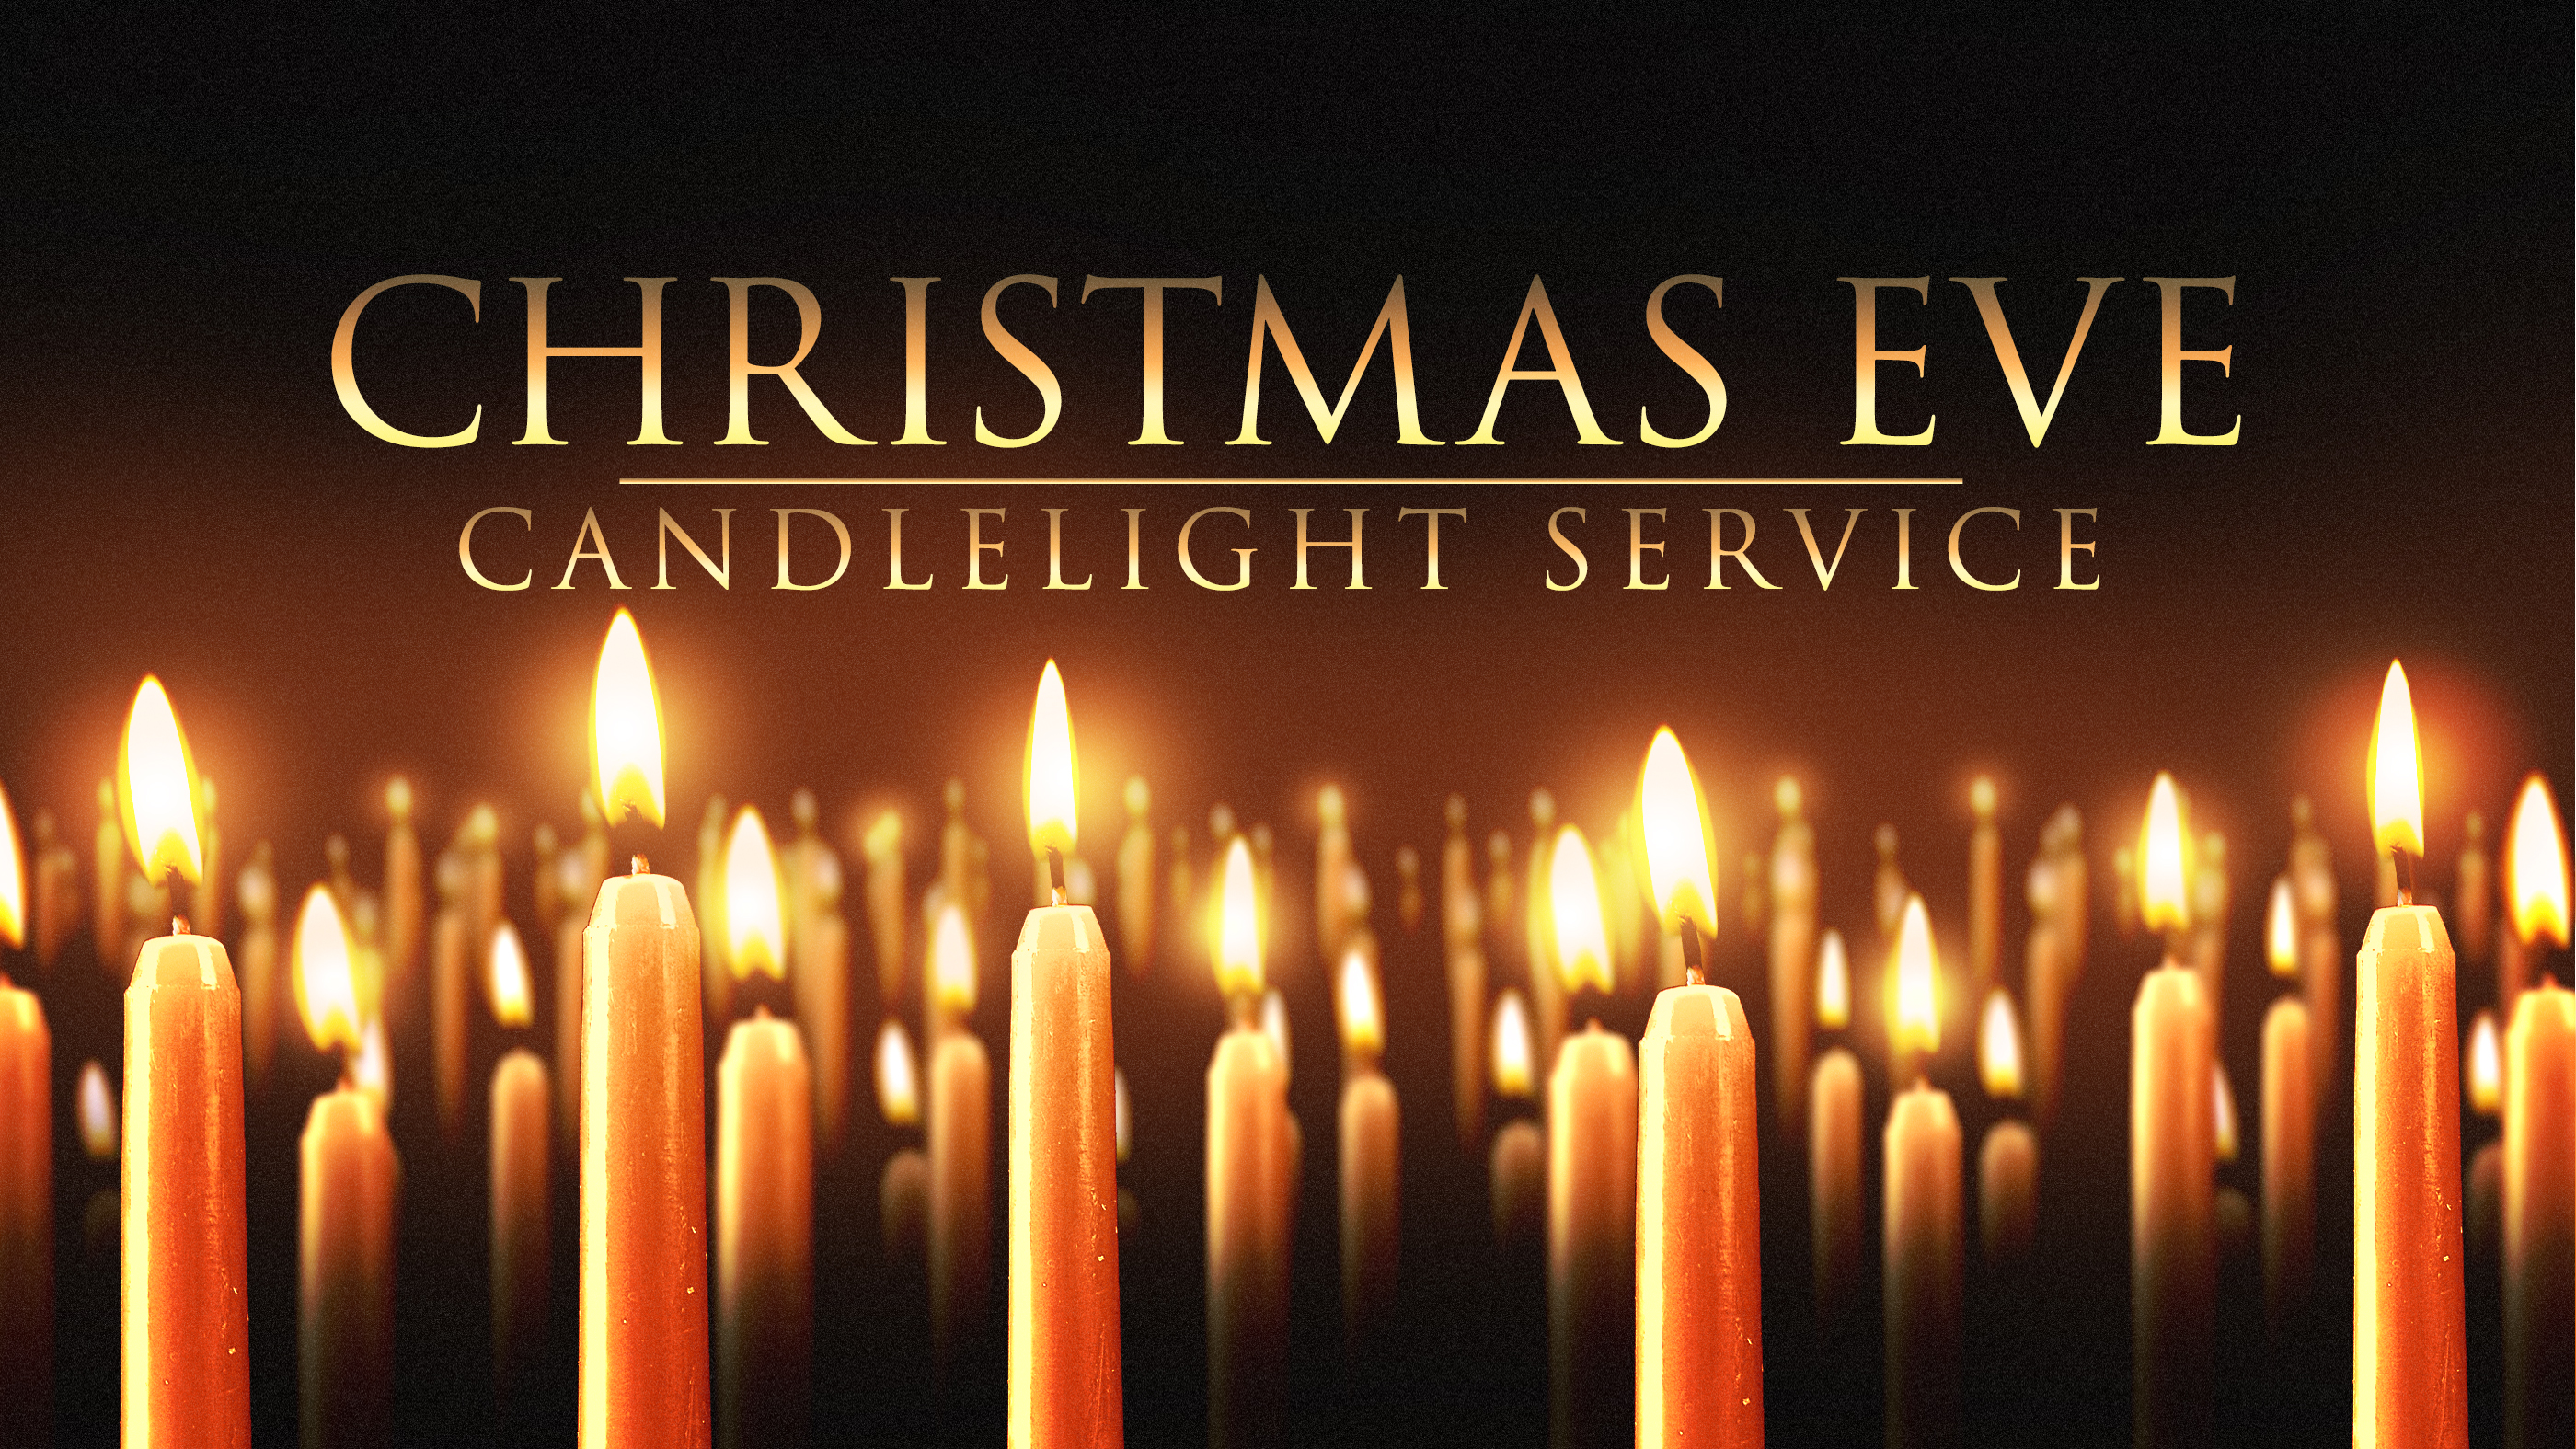 christmas eve service christmas eve service - Christmas Eve Service Near Me